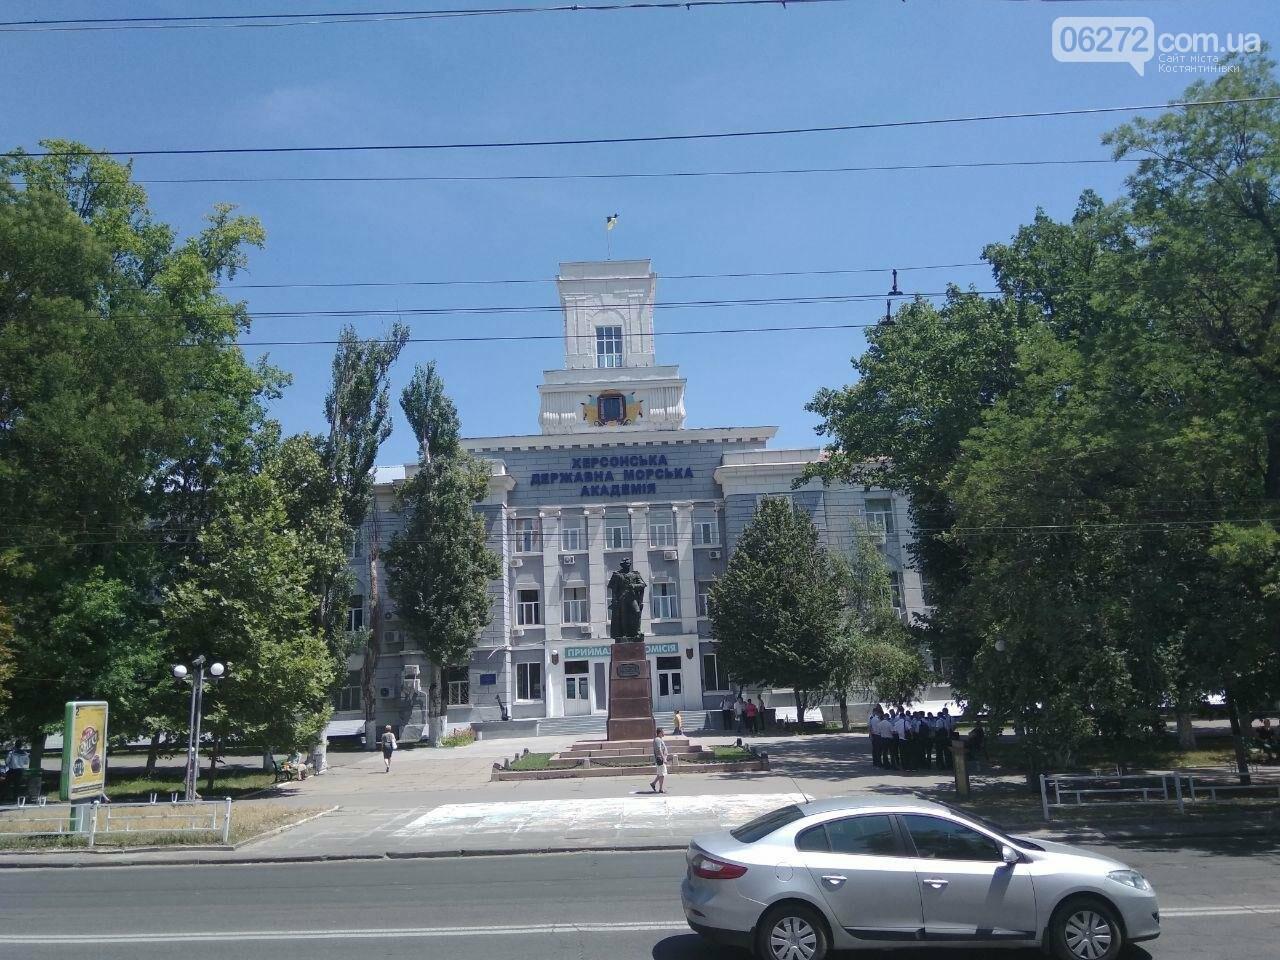 Автостопом по Украине: все пошло не по плану, фото-10